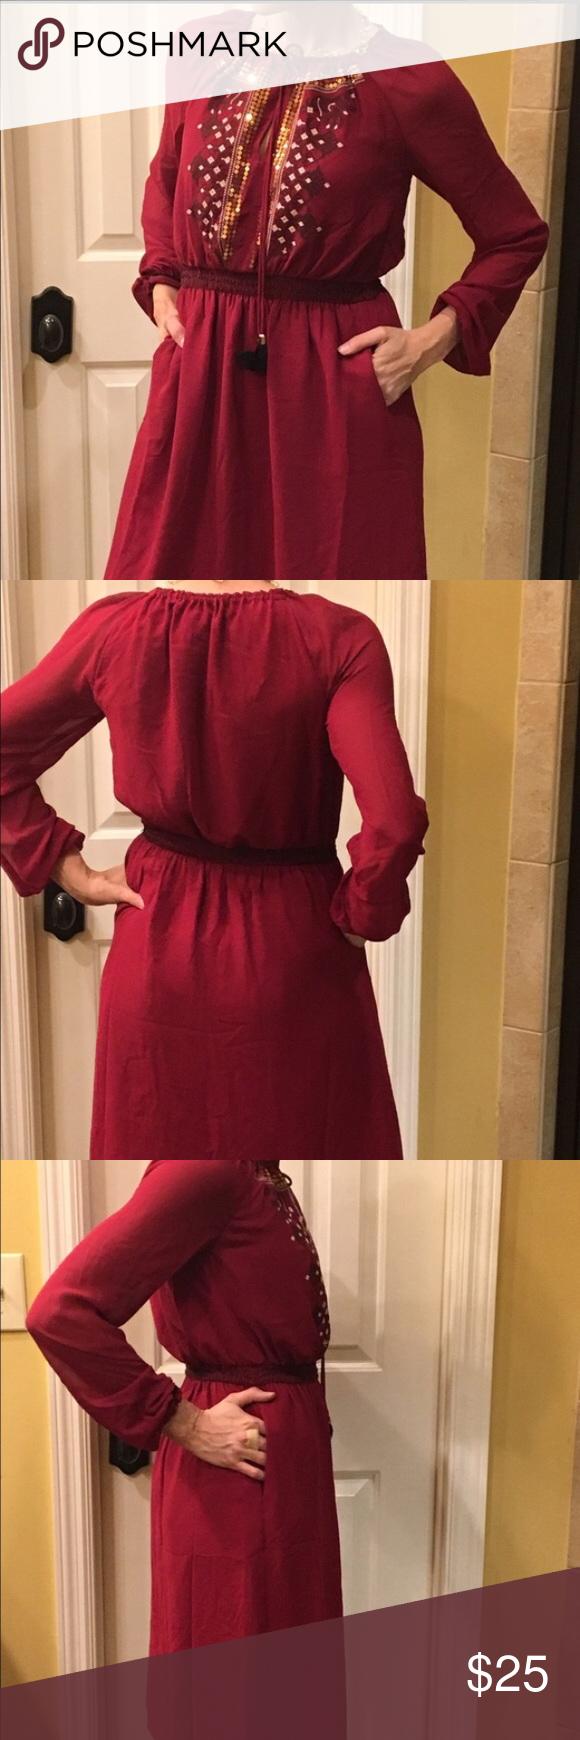 NWT Altuzarra dress NWT Altuzarra pullover style peasant dress. Altuzarra Dresses